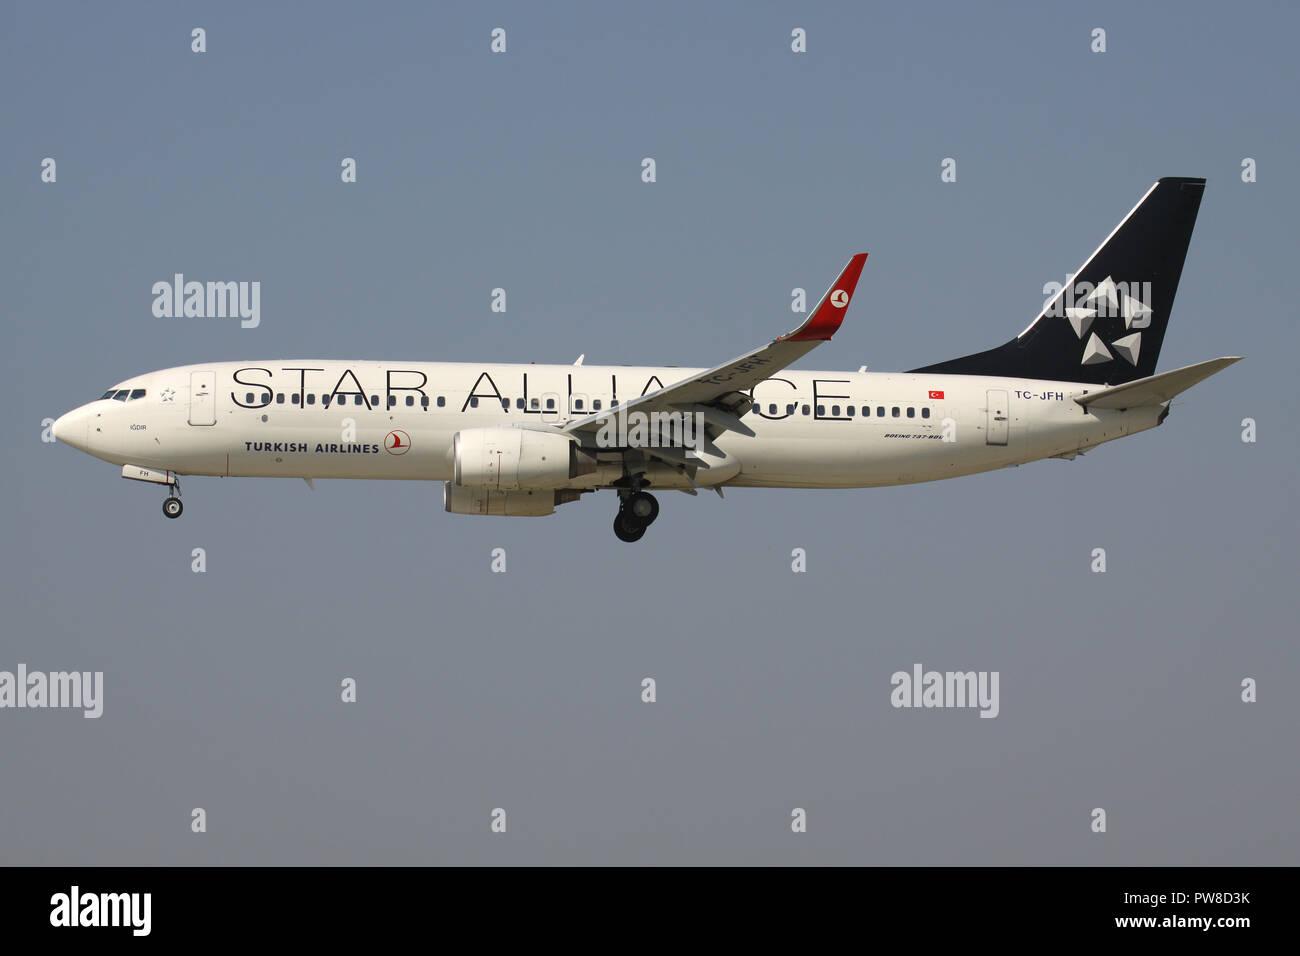 B737 800 Plane Stock Photos & B737 800 Plane Stock Images